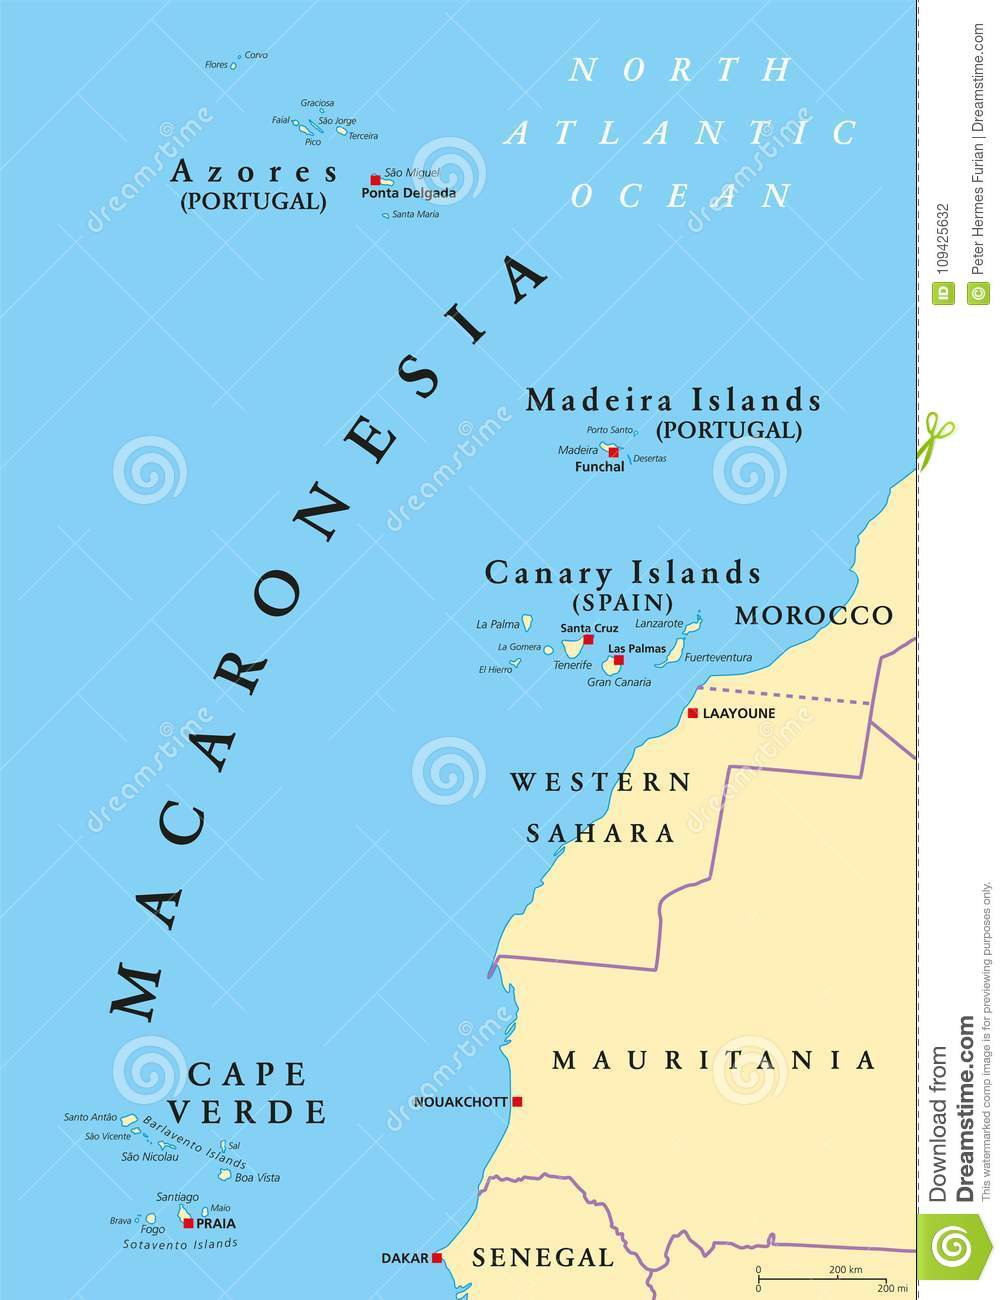 mapa-político-de-macaronesia-109425632.jpg